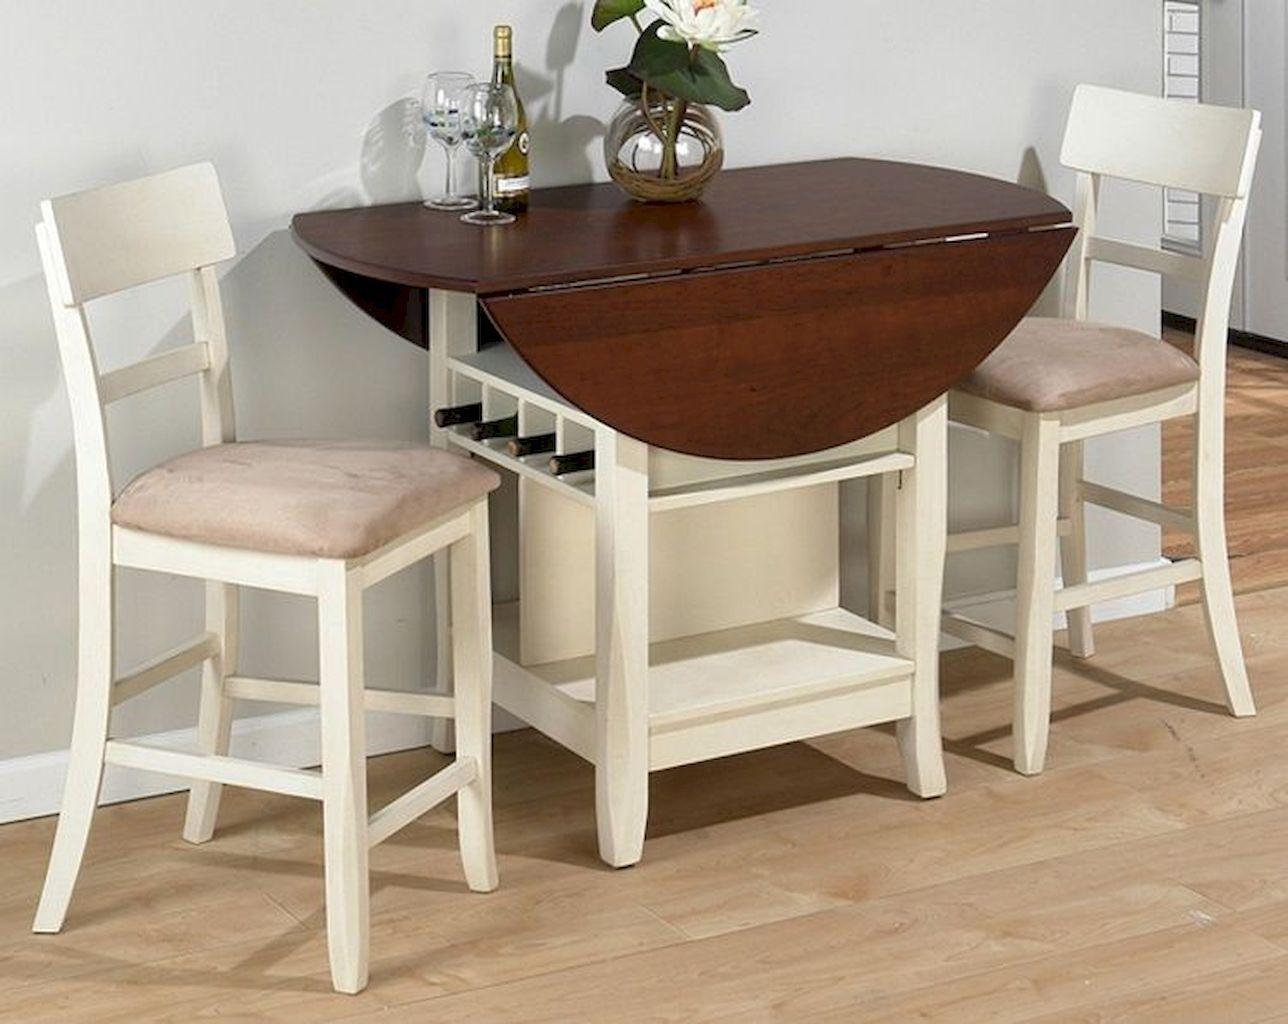 Stunning Small Island Kitchen Table Ideas Home To Z Small Kitchen Table Sets Small Round Kitchen Table Kitchen Table Settings